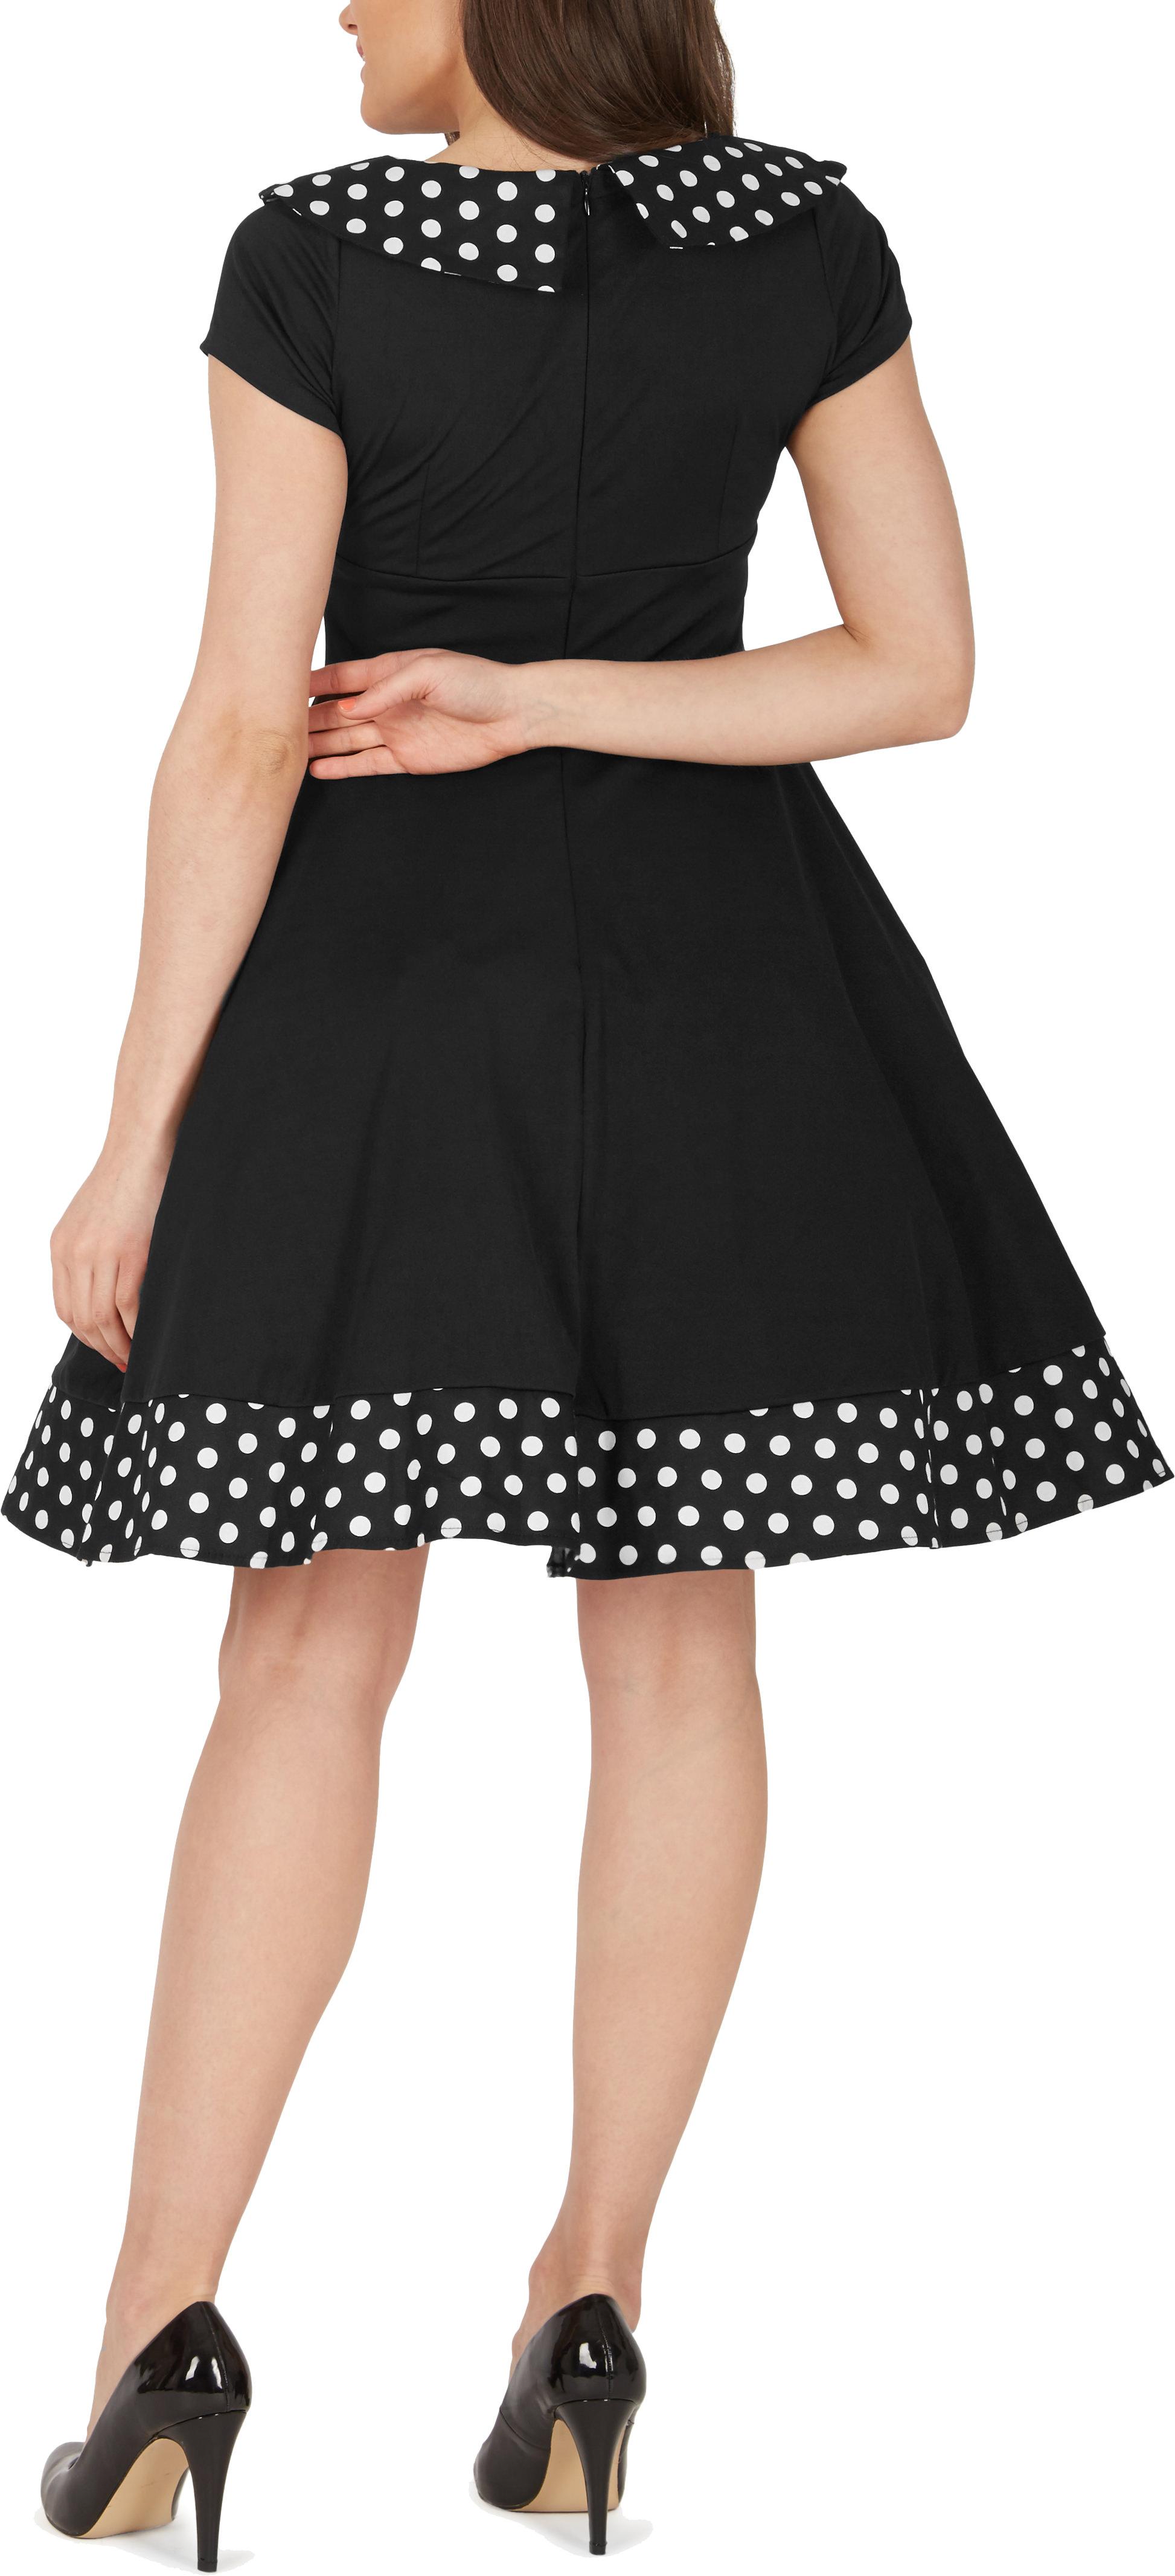 039-Rhianna-039-Vintage-Polka-Dot-Pin-Up-1950-039-s-Rockabilly-Swing-Prom-Dress miniatuur 4